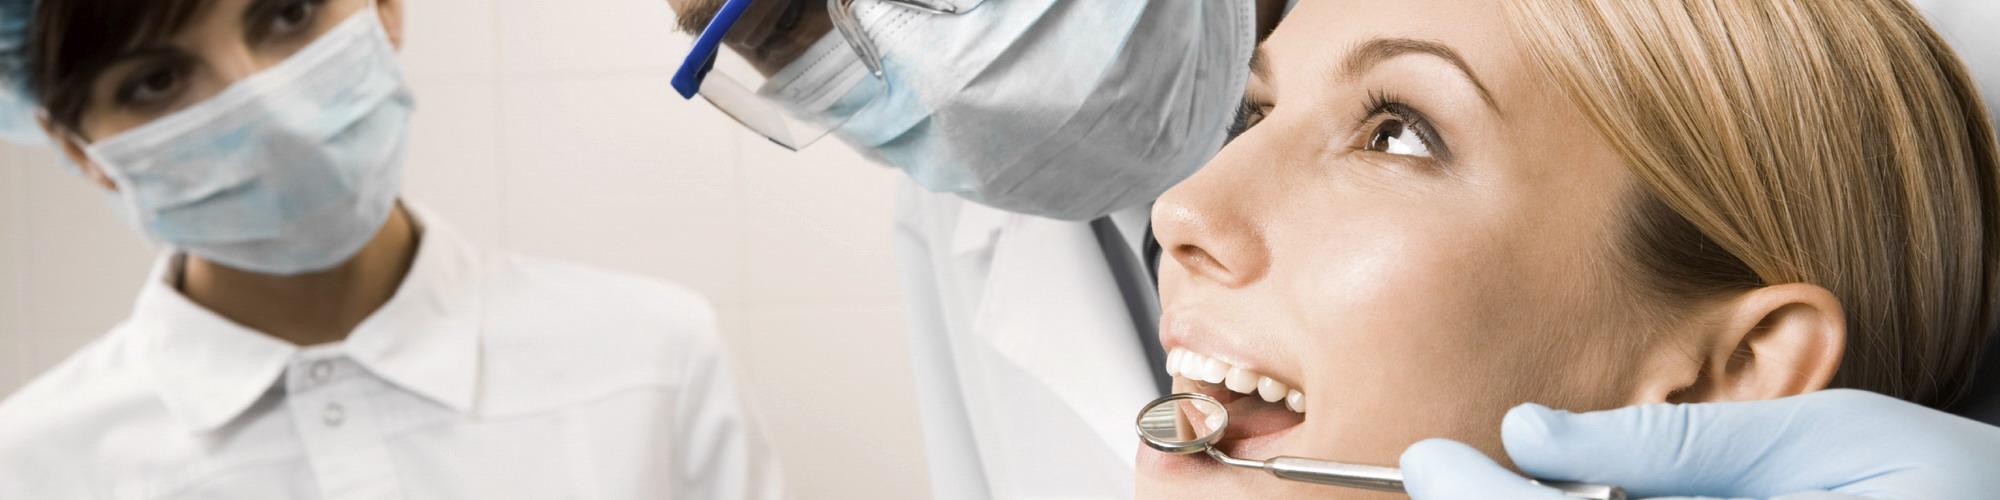 Medicinos paslaugos